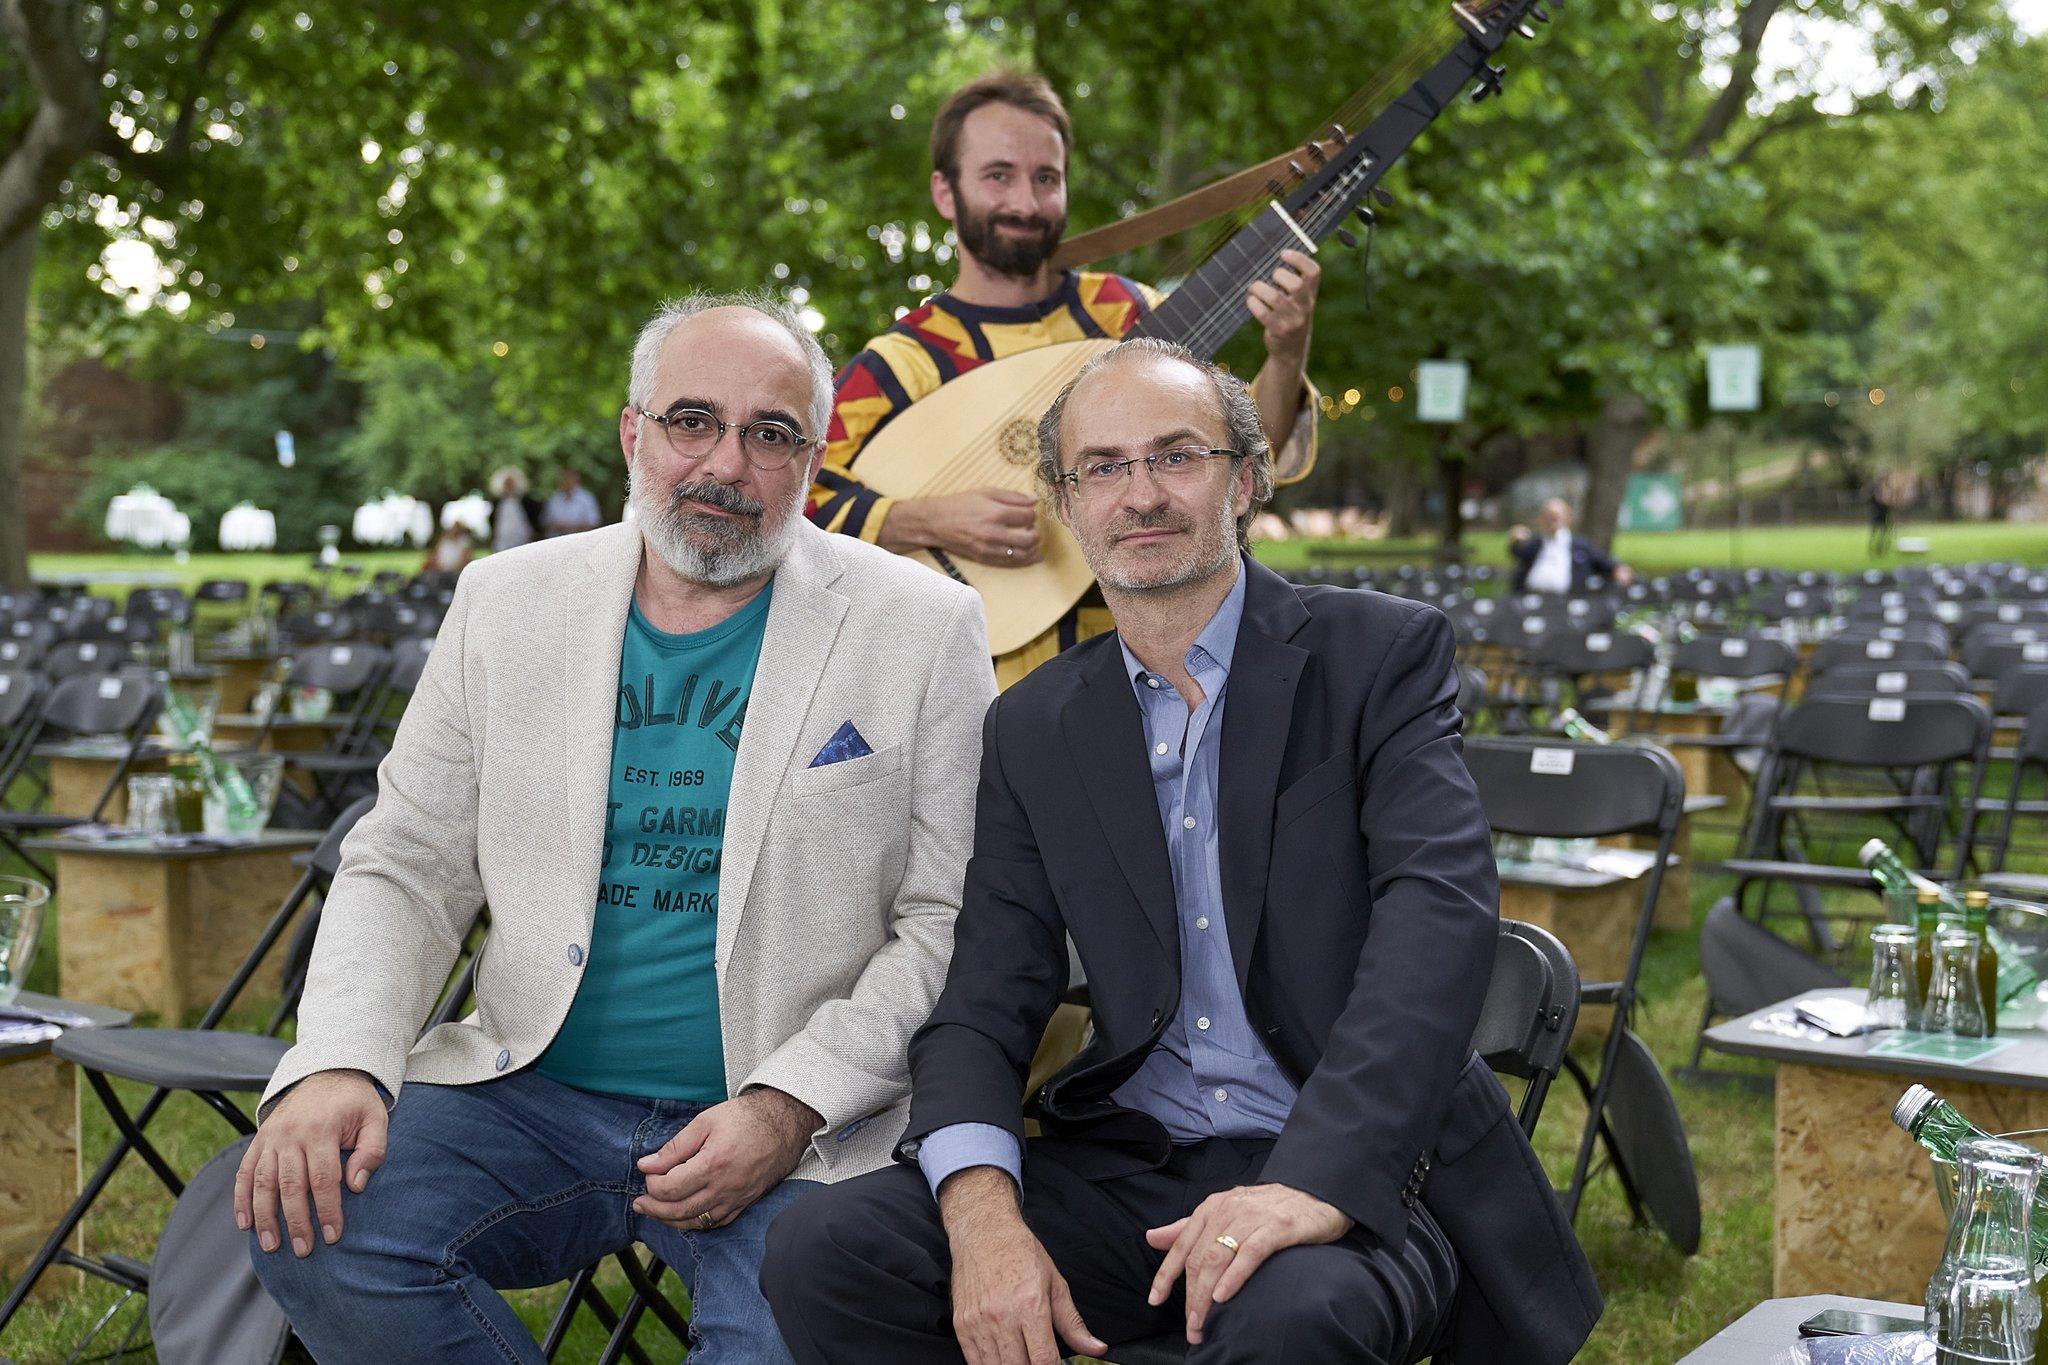 Open Air Georg Hoanzl And Michael Niavarani Open Theater Im Park Archyworldys